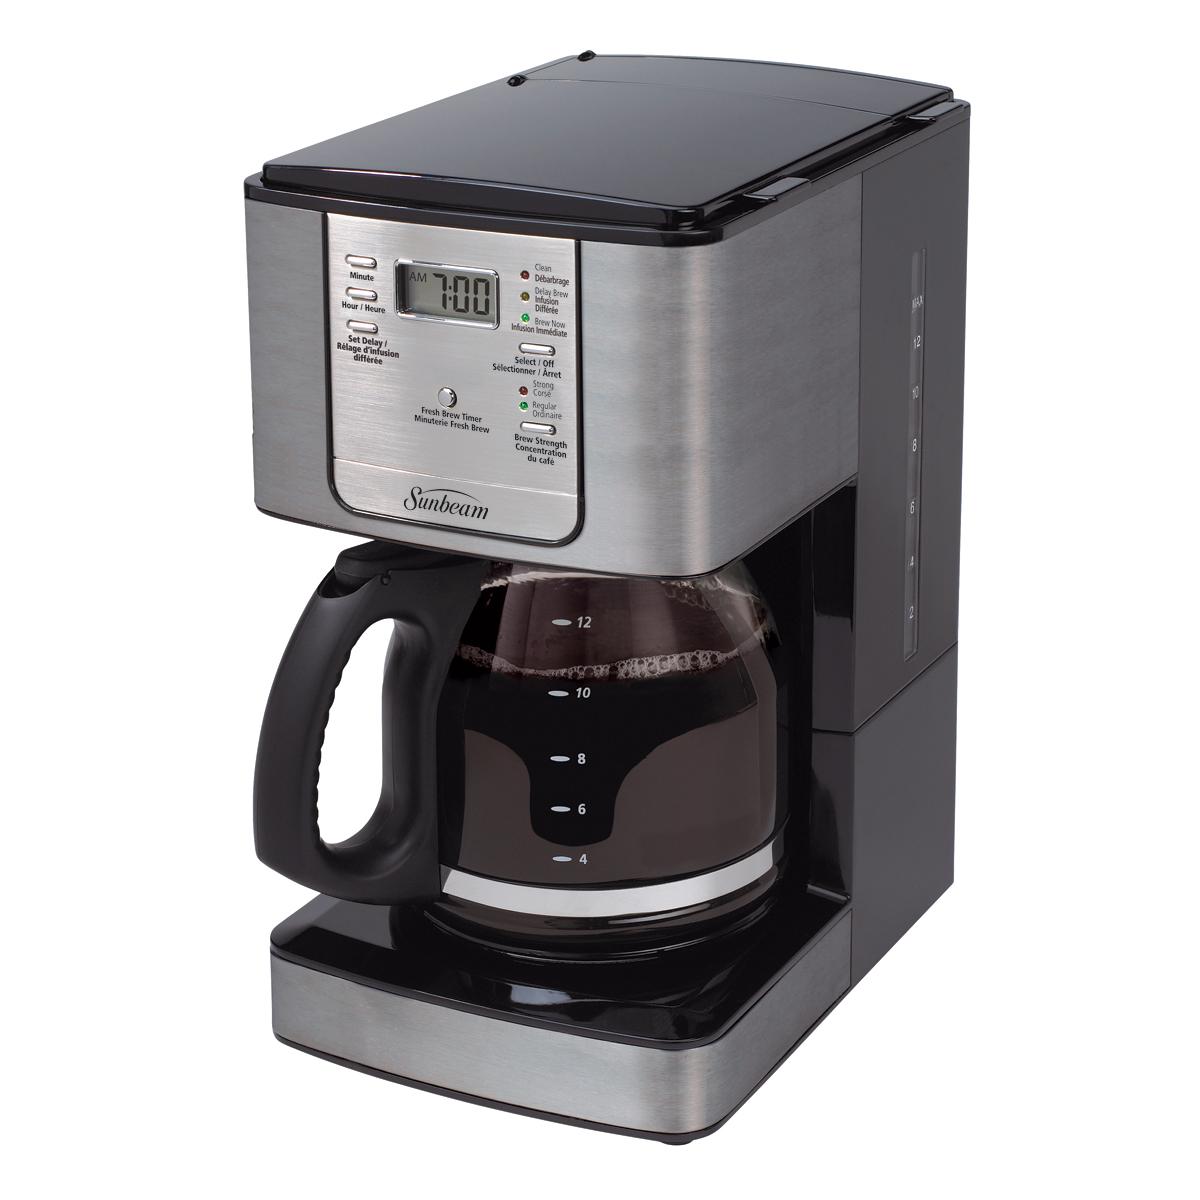 Coffee Makers At Walmart ~ Sunbeam cup programmable coffeemaker smoke pearl